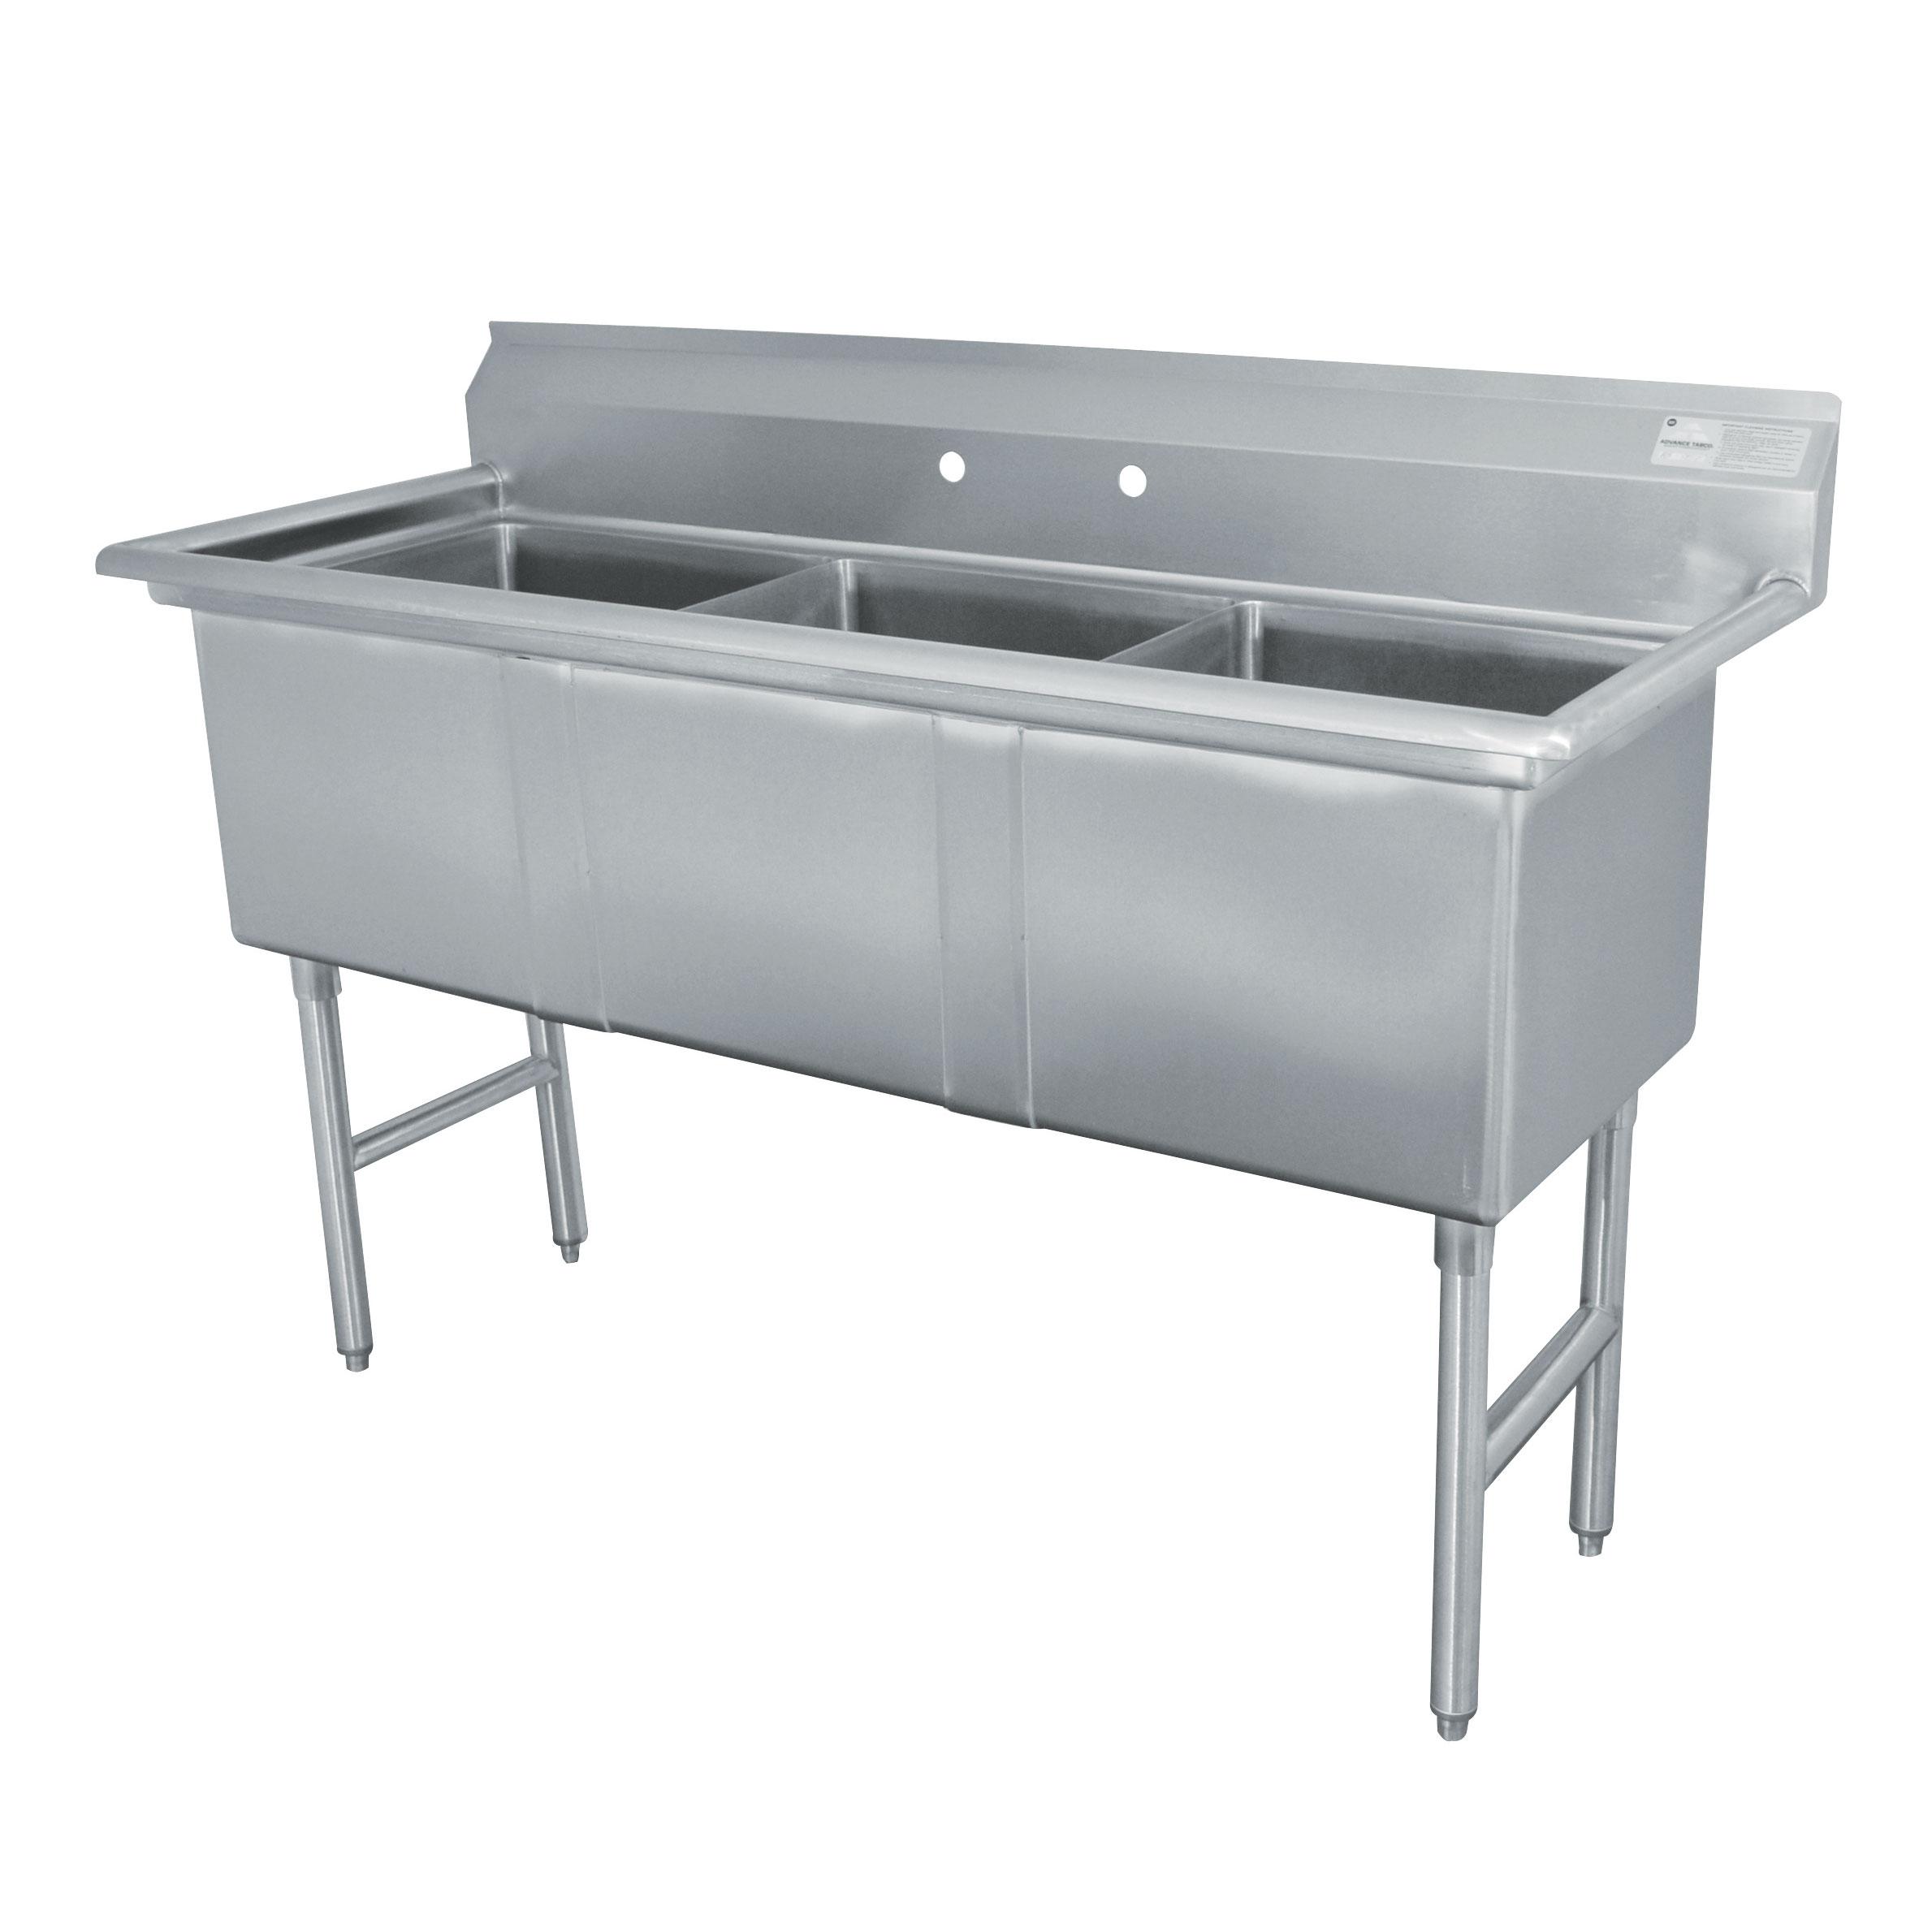 Advance Tabco FC-3-1515-X sink, (3) three compartment